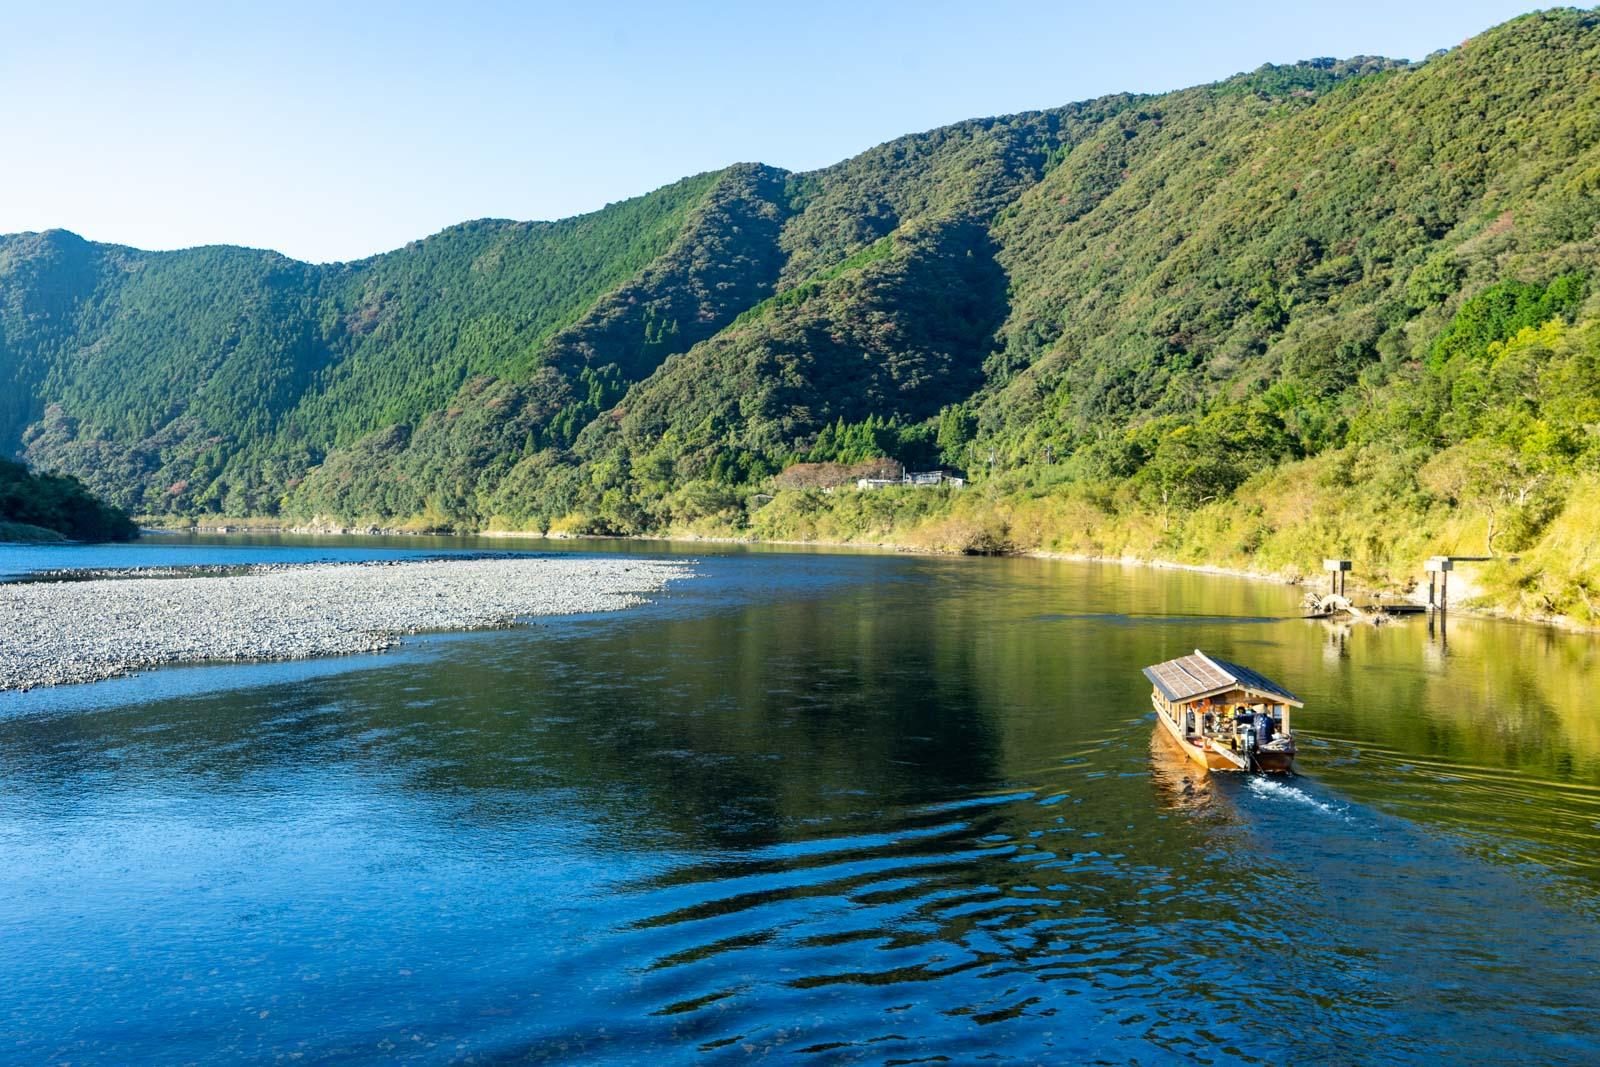 Shimanto River, Kochi, Japan